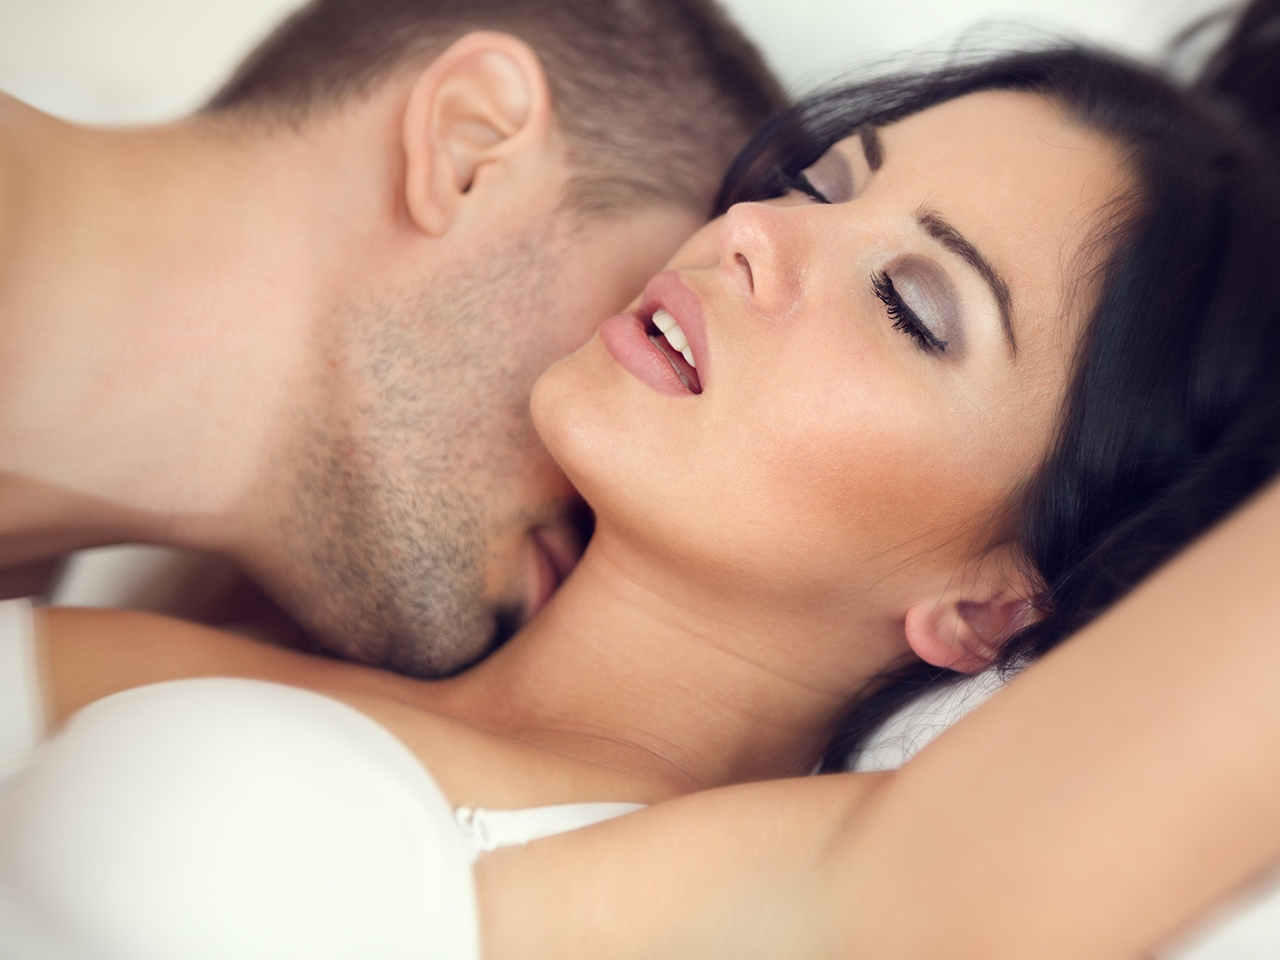 sex-amature-naked-woman-seducing-boyfriend